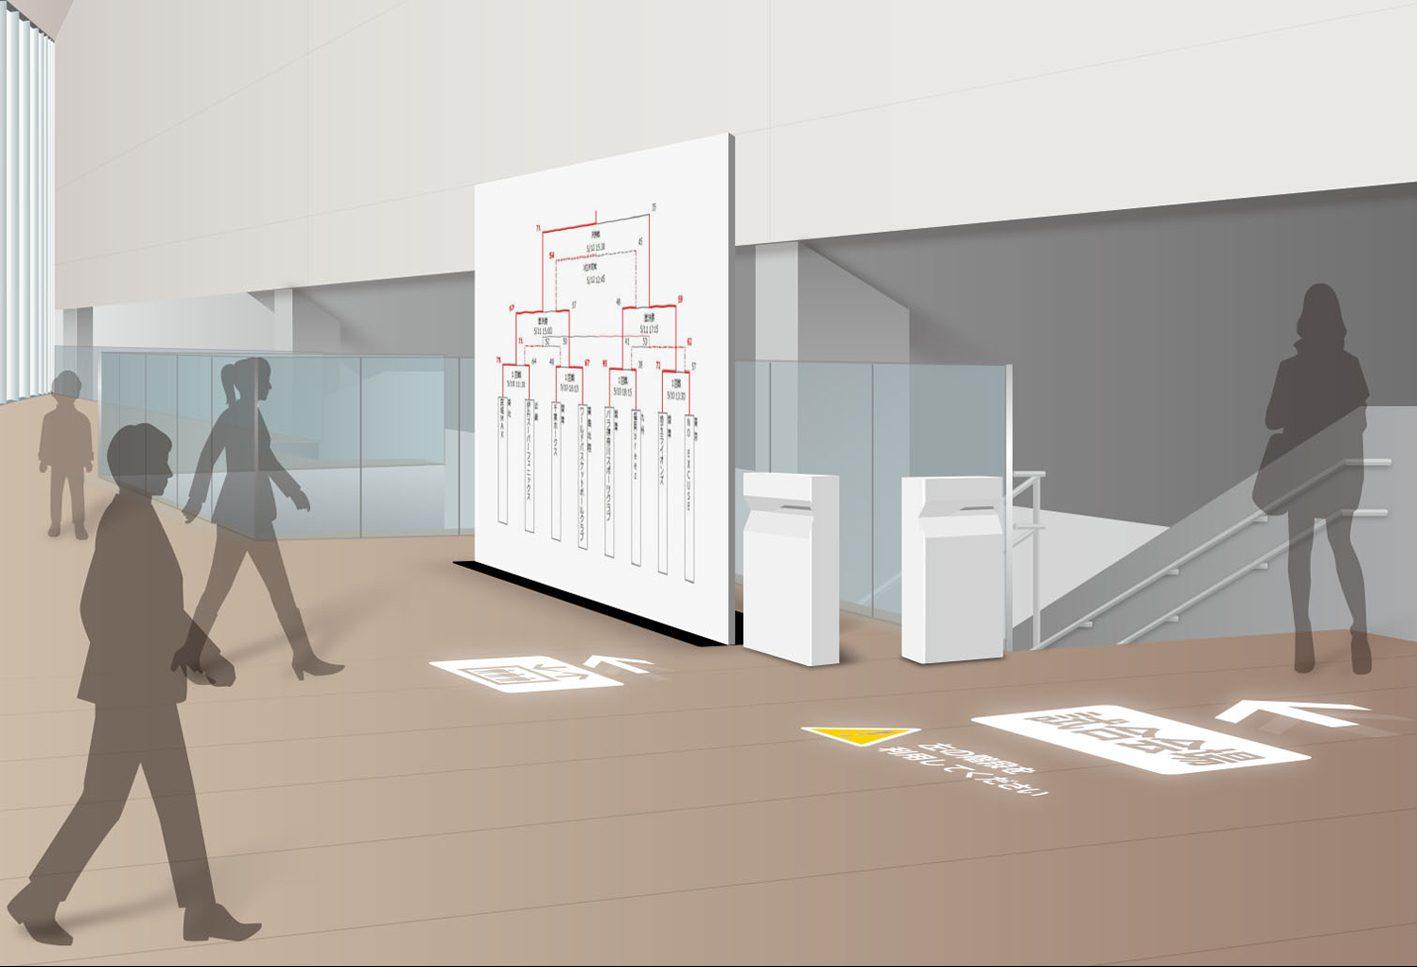 Mitsubishi Electric digital sign technology trial simulation